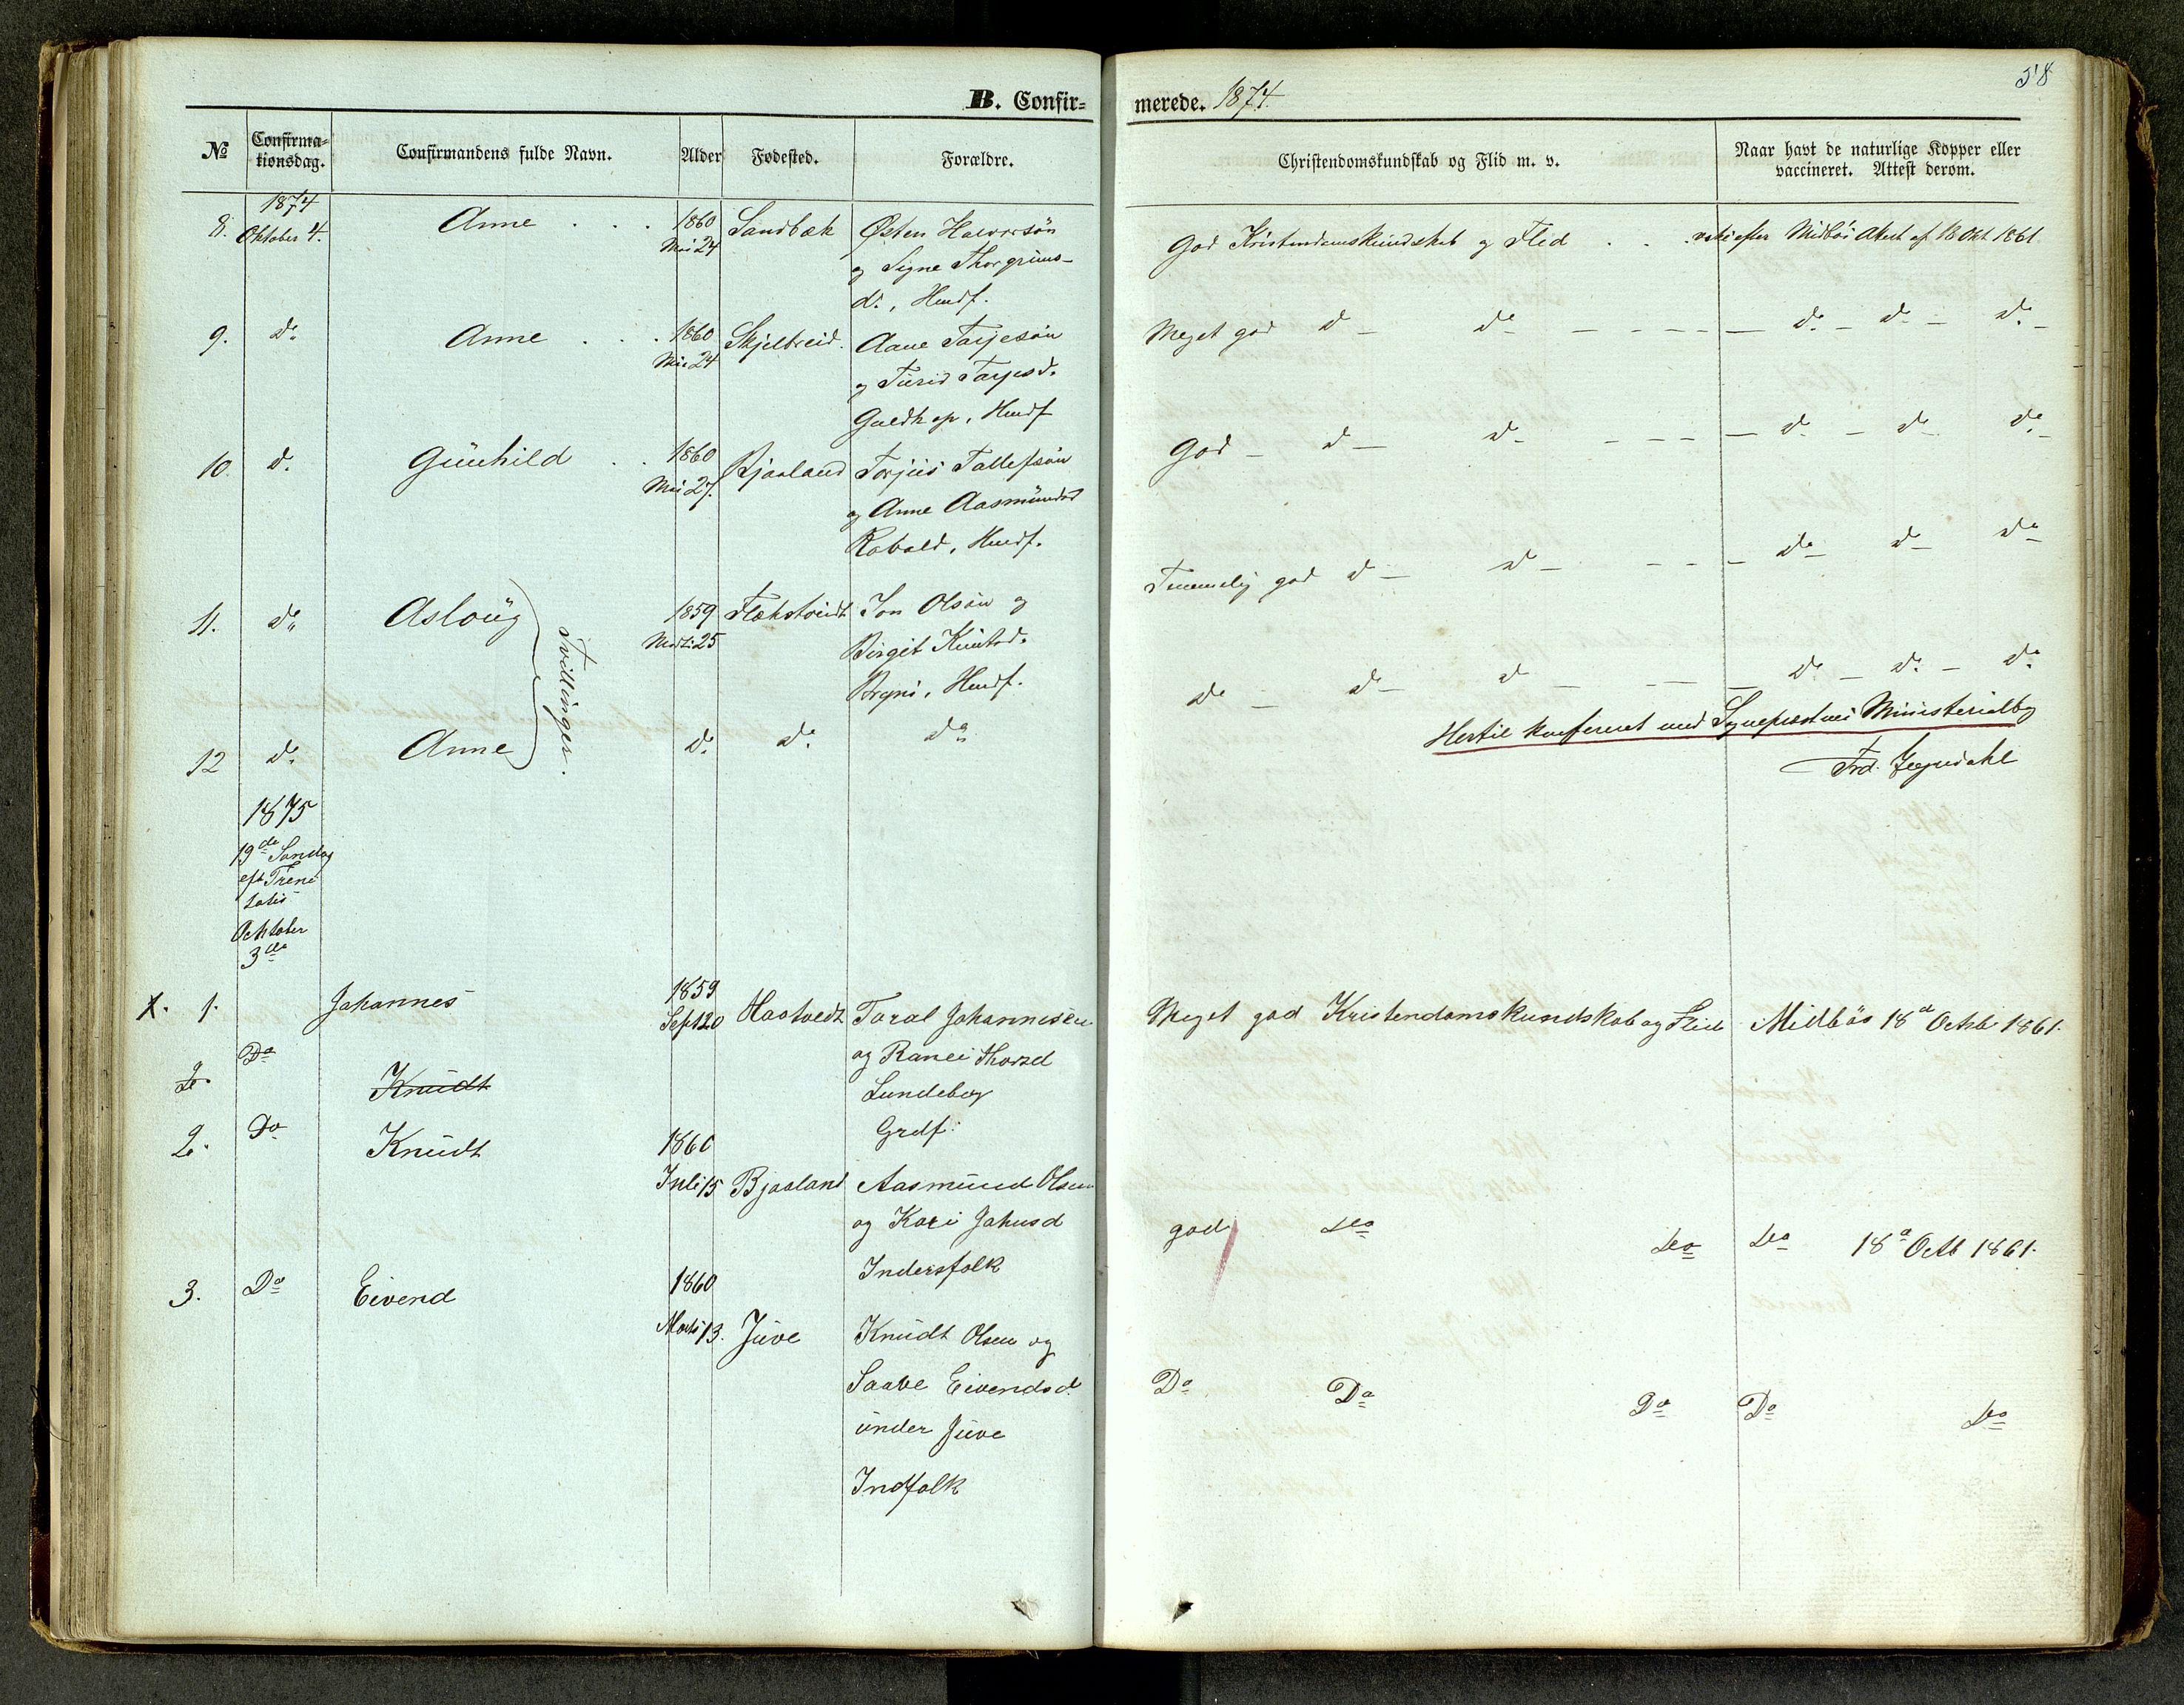 SAKO, Lårdal kirkebøker, G/Ga/L0002: Klokkerbok nr. I 2, 1861-1890, s. 58